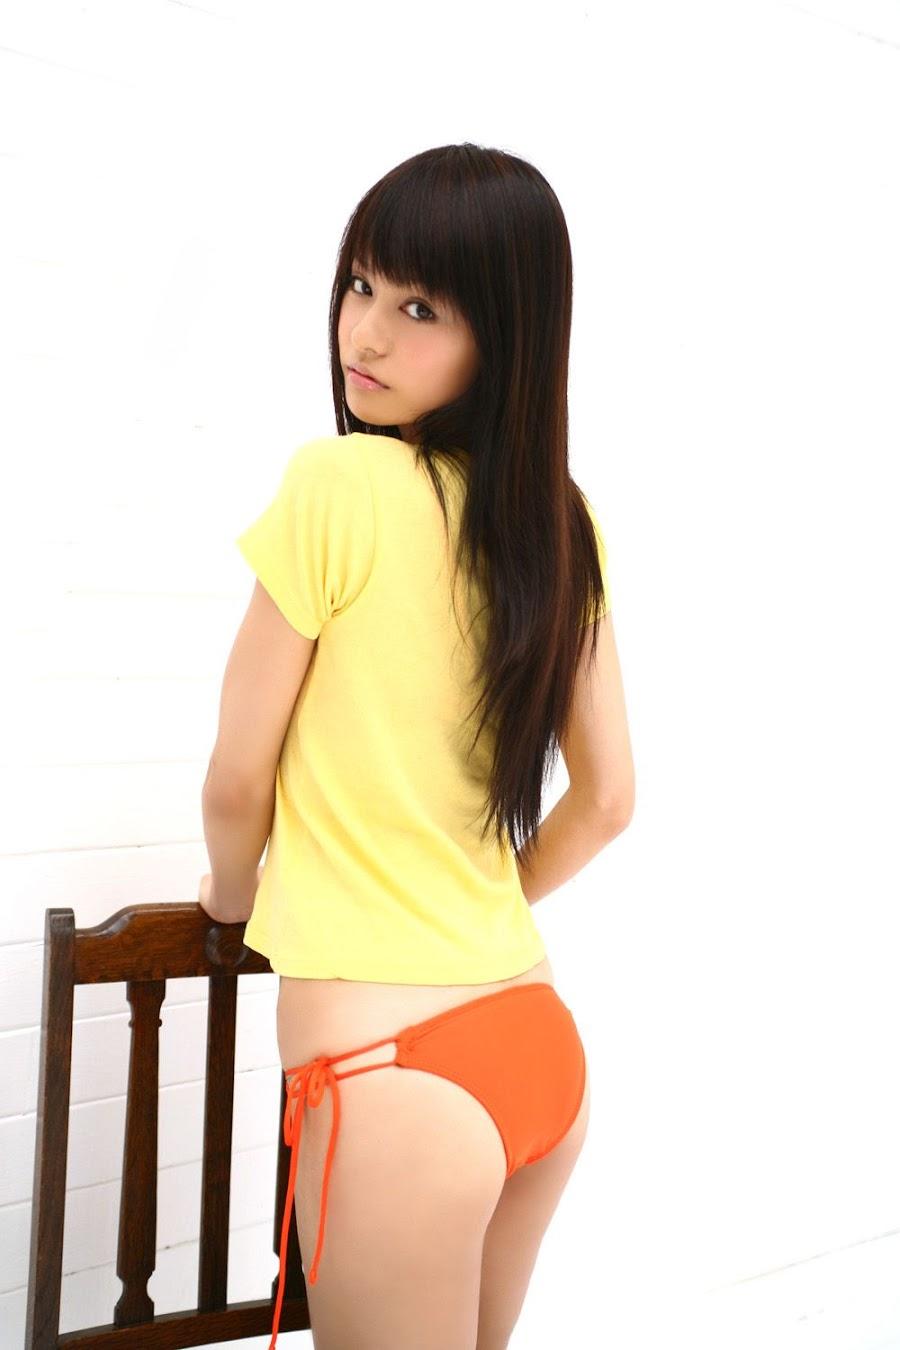 Yuriko Shiratori - sexy Japanese gravure idol and actress